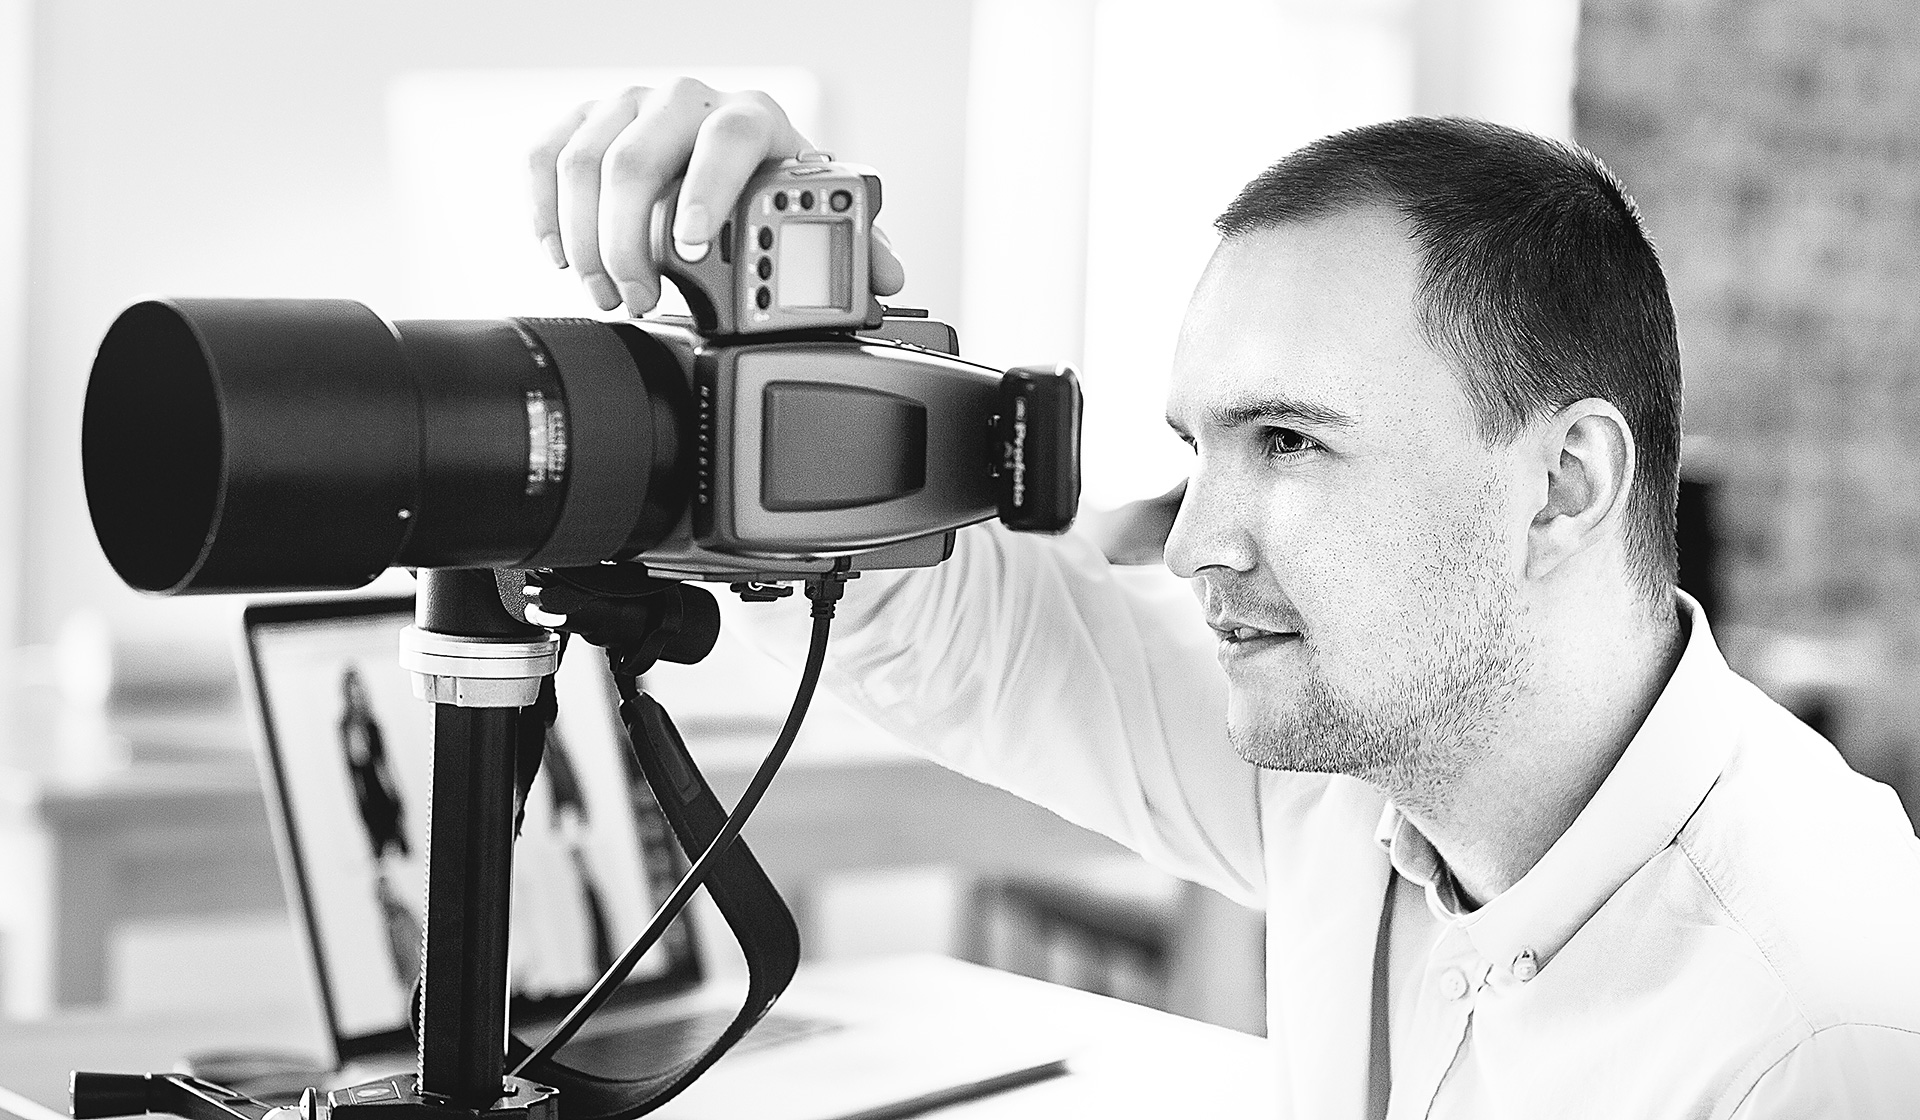 About | Alexander Sakulin - Professional photographer